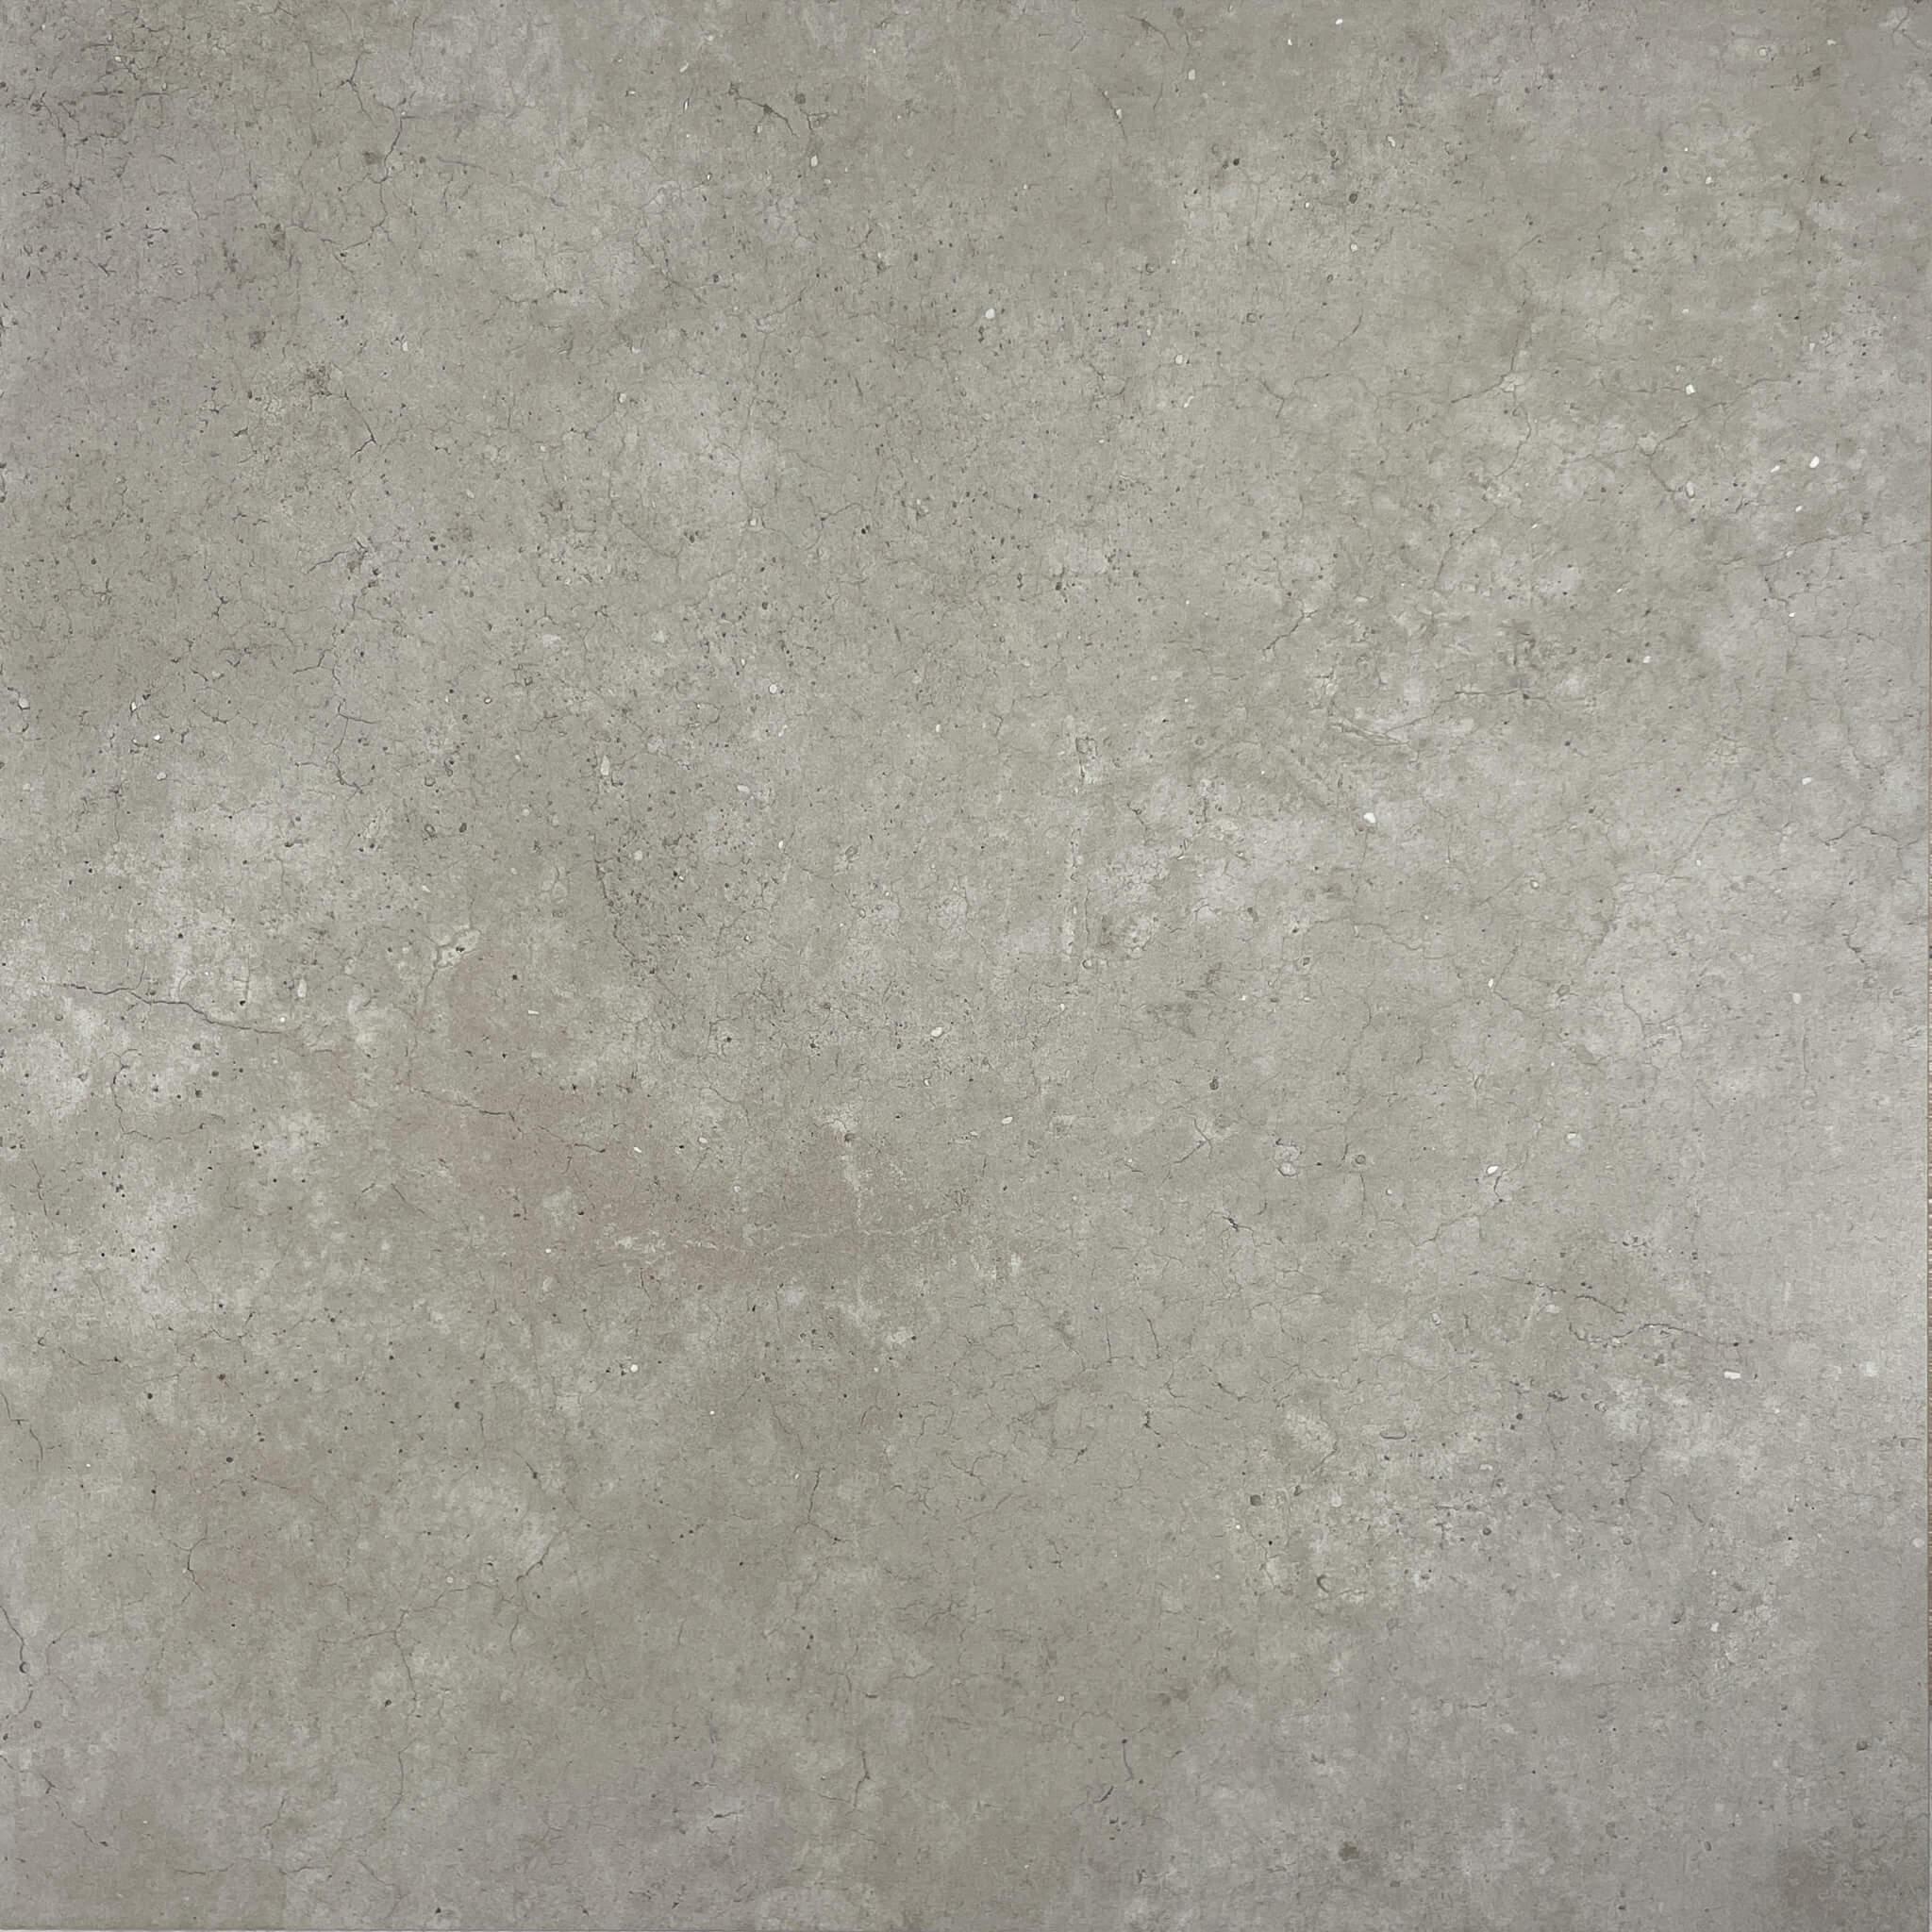 Industrial Silver Concrete Look Matt Finish Rectified Italian Porcelain Tile 3919